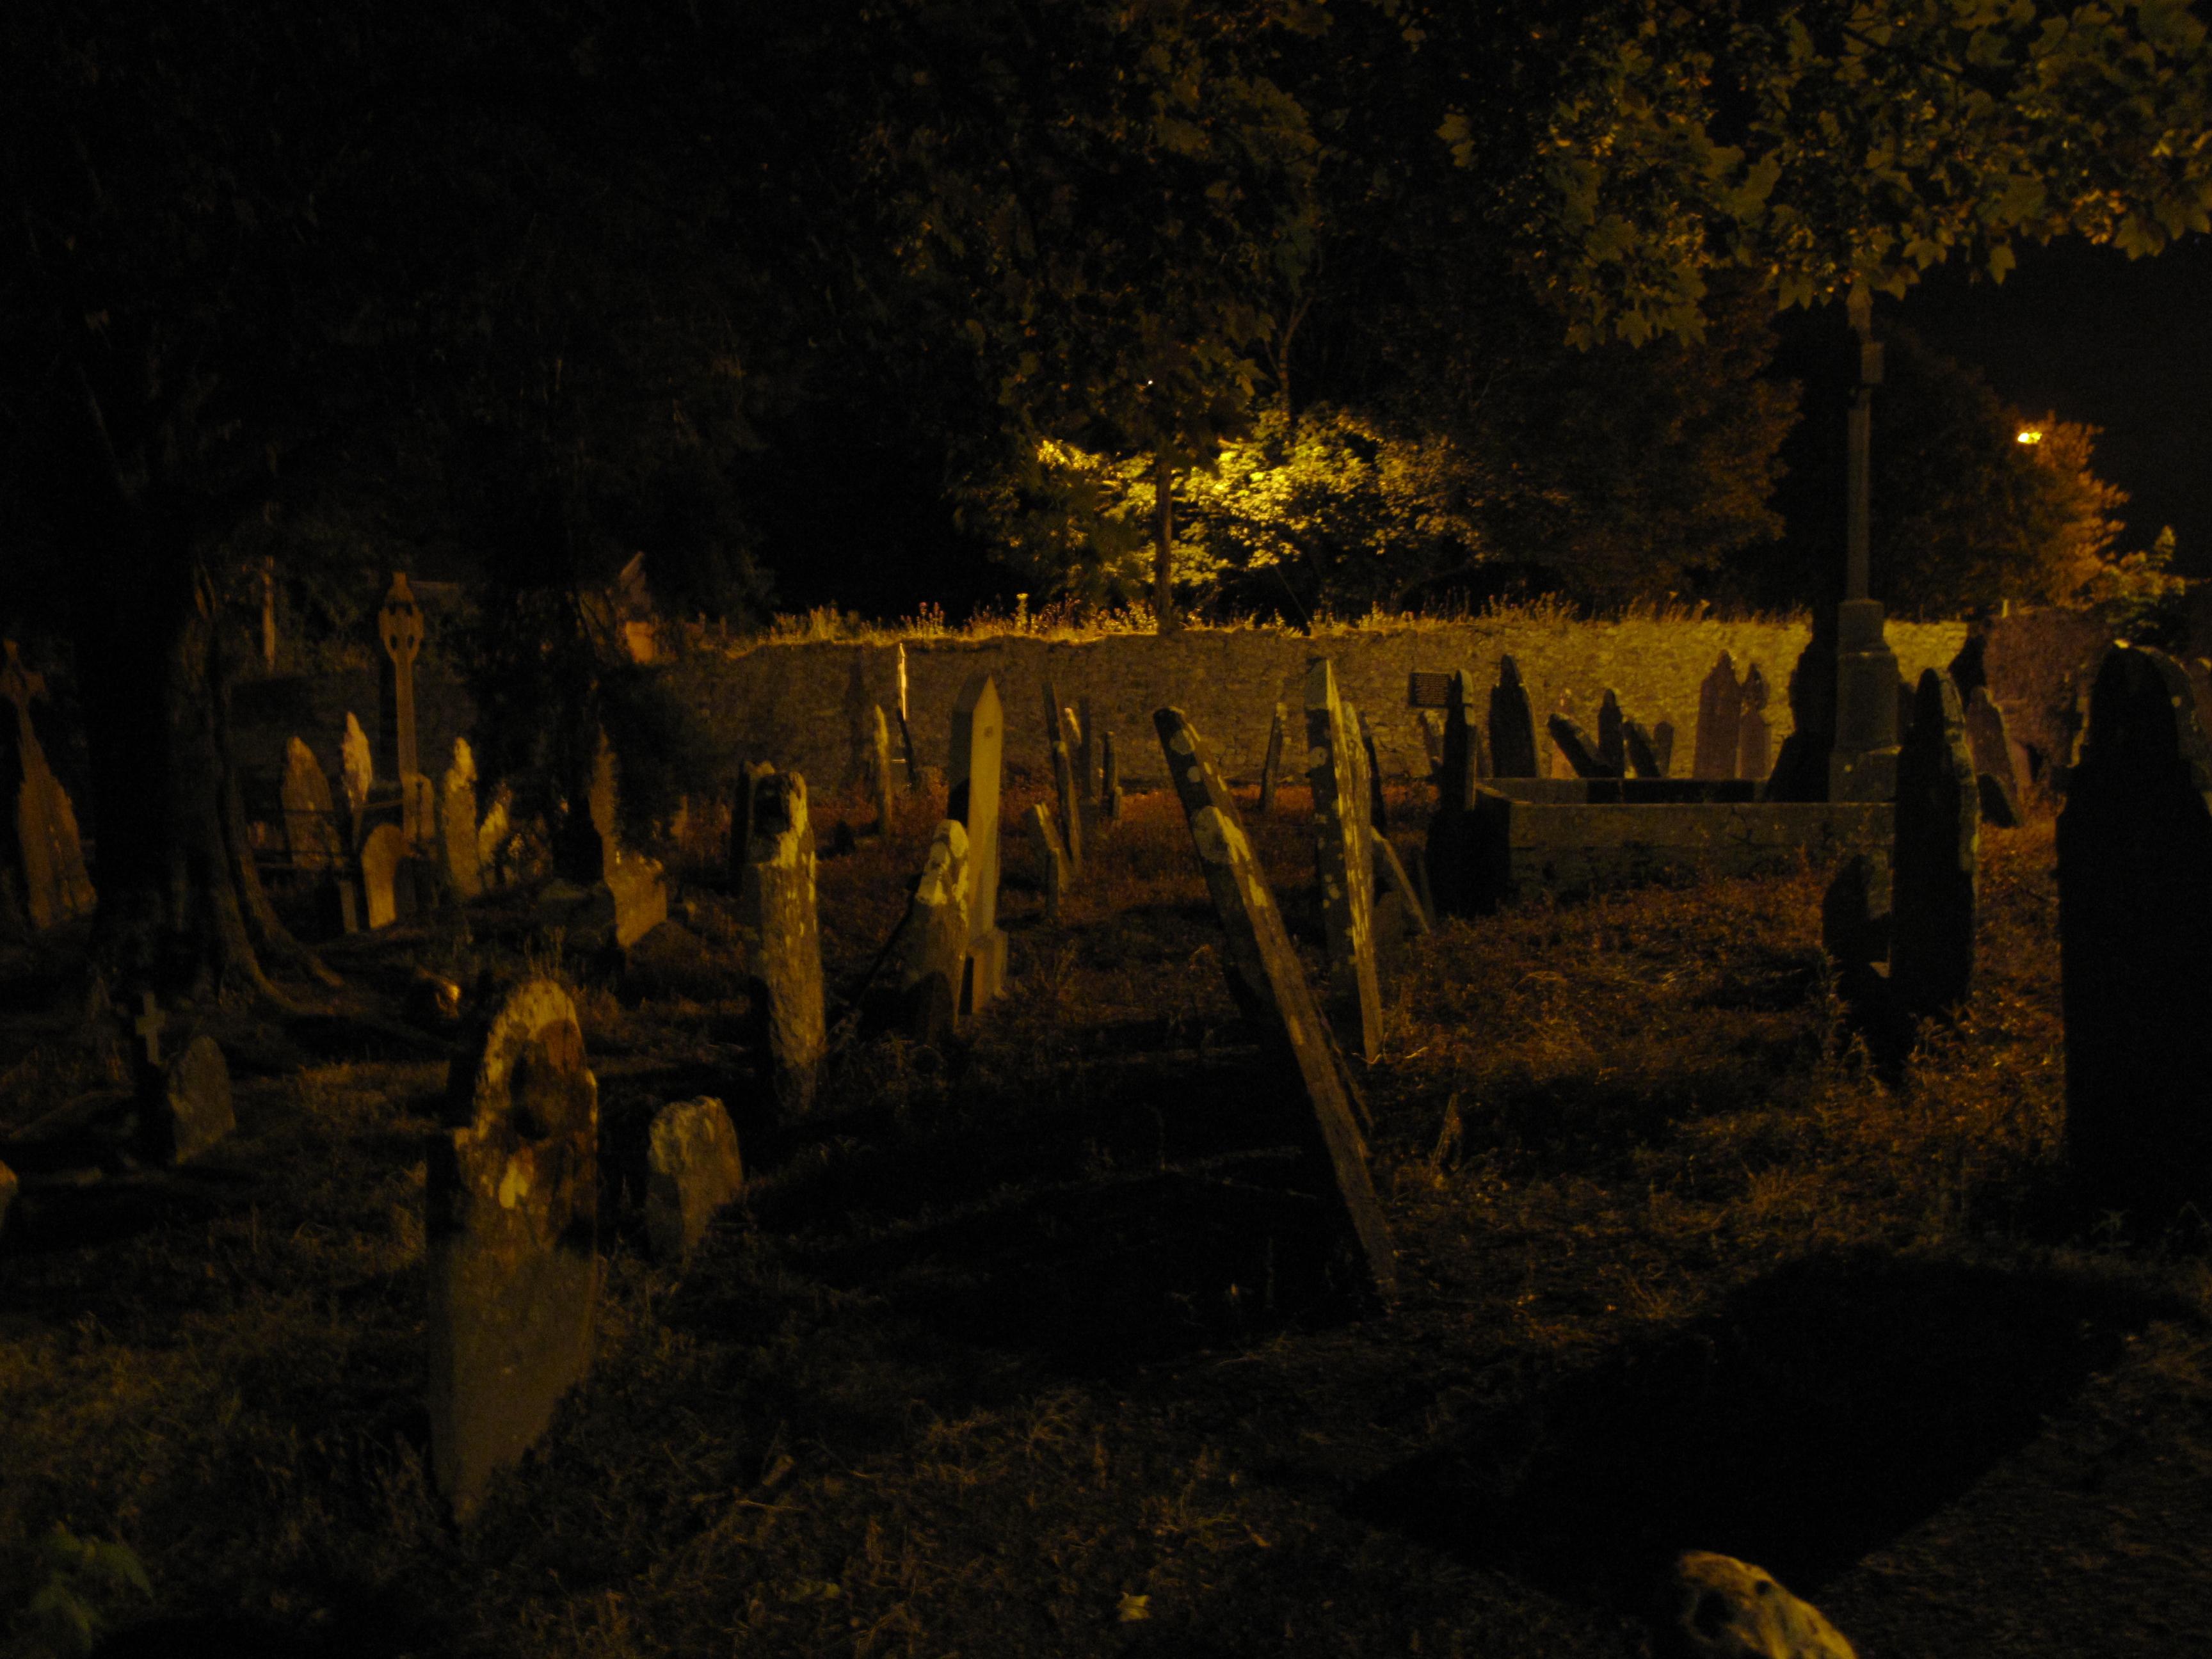 File:Temple Hill Graveyard (Cork) at night 02.JPG - Wikimedia Commons